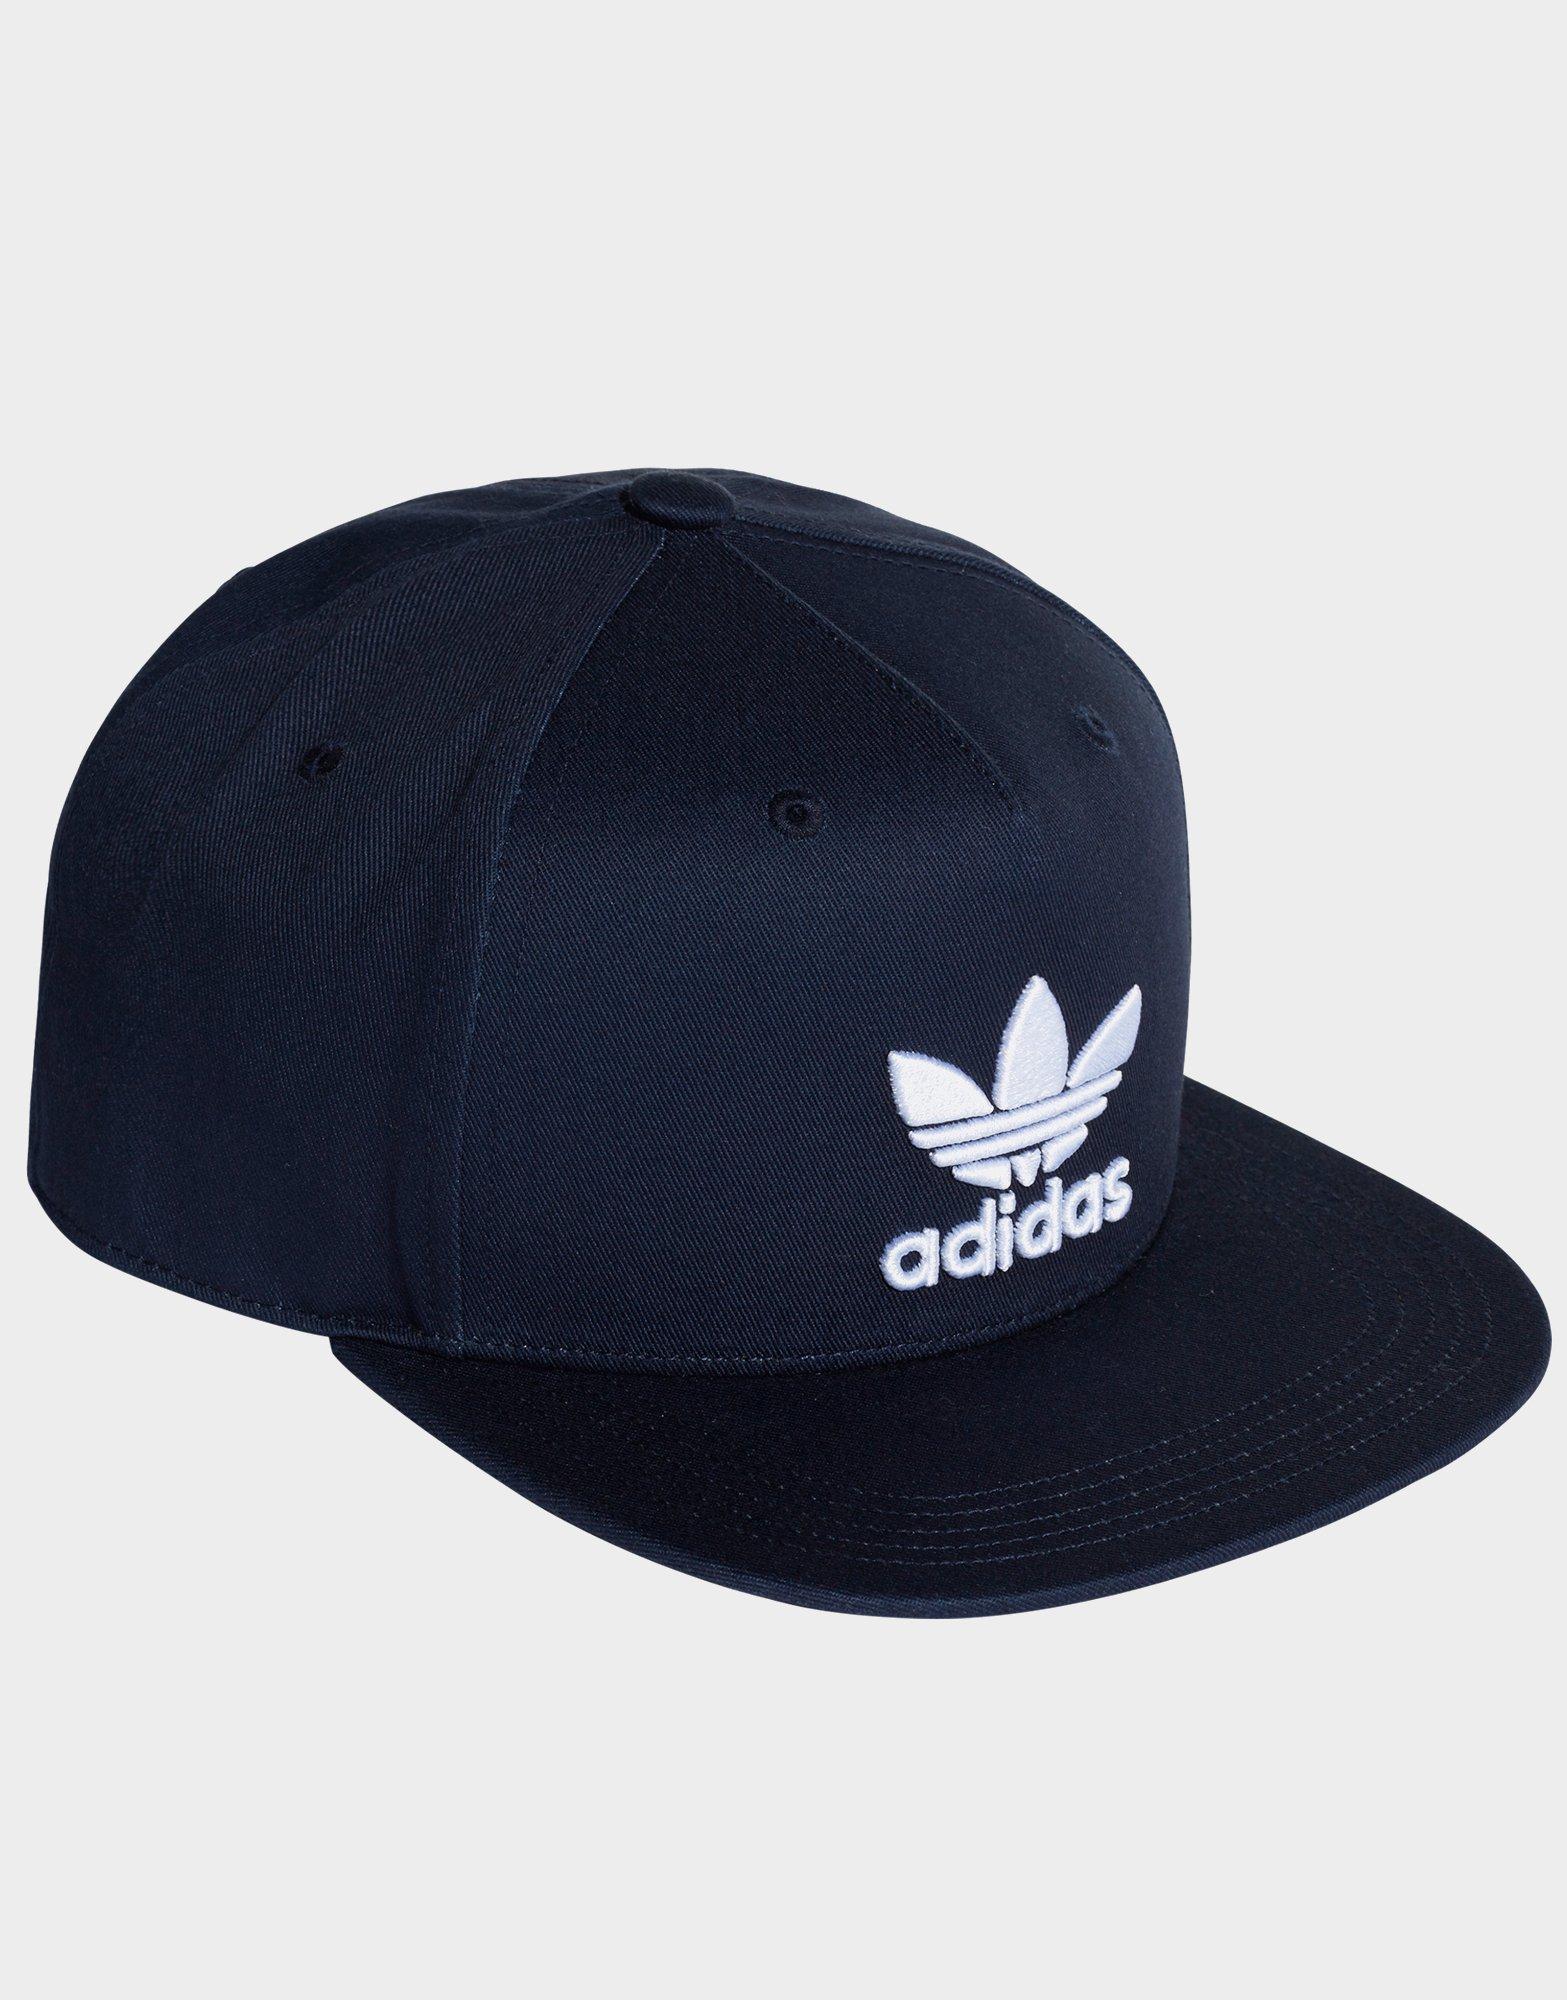 c052c155cc0 Adidas - Blue Trefoil Snap-back Cap - Lyst. View fullscreen